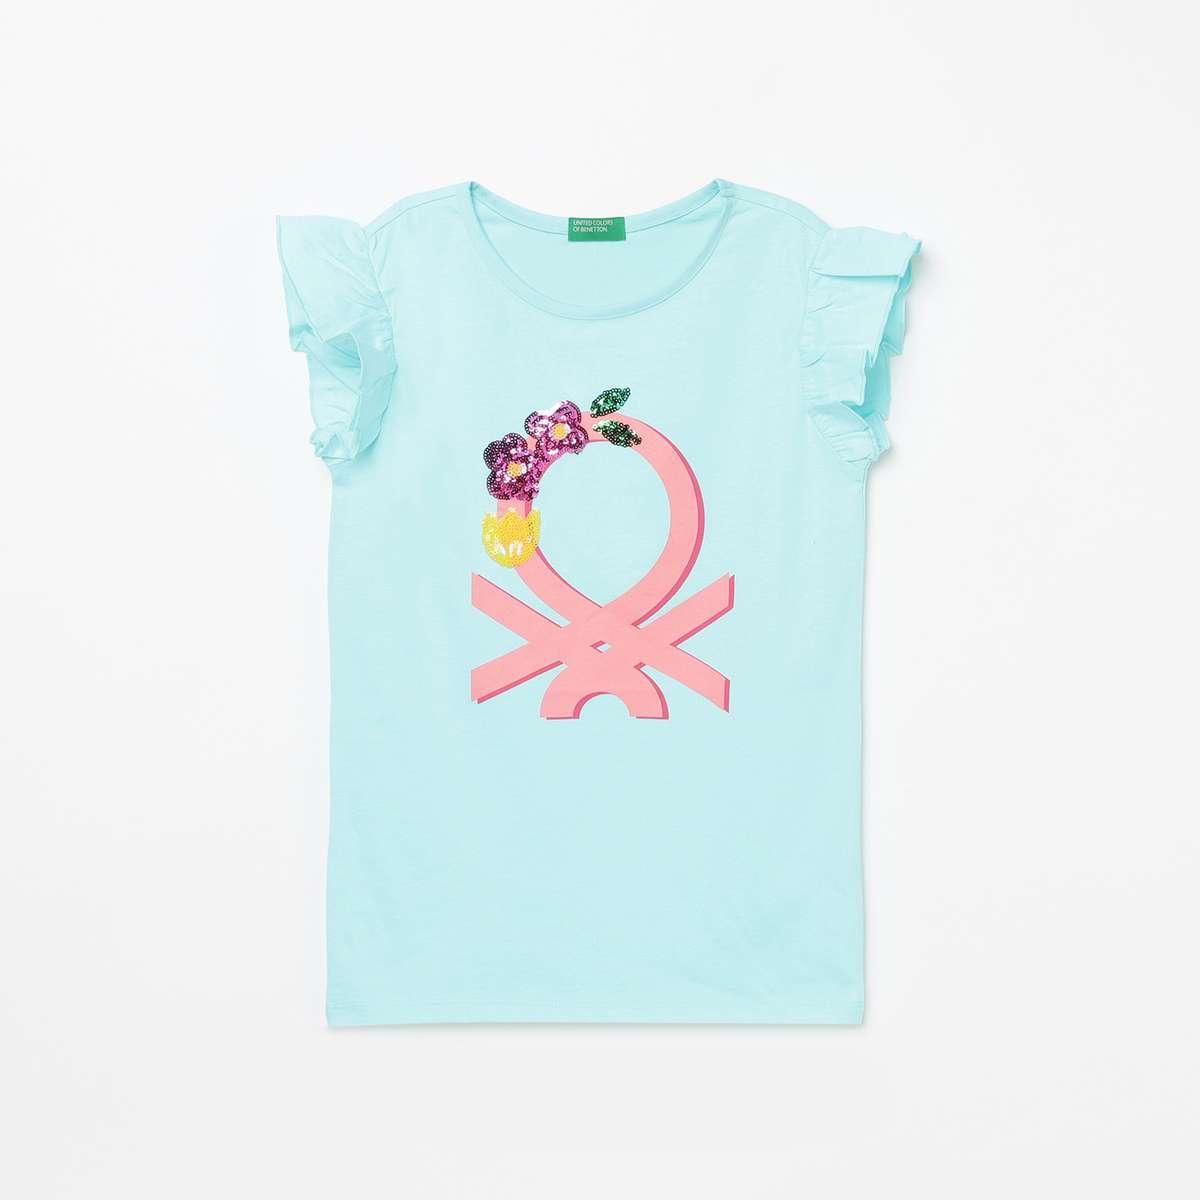 UNITED COLORS OF BENETTON Girls Embellished Round Neck T-shirt